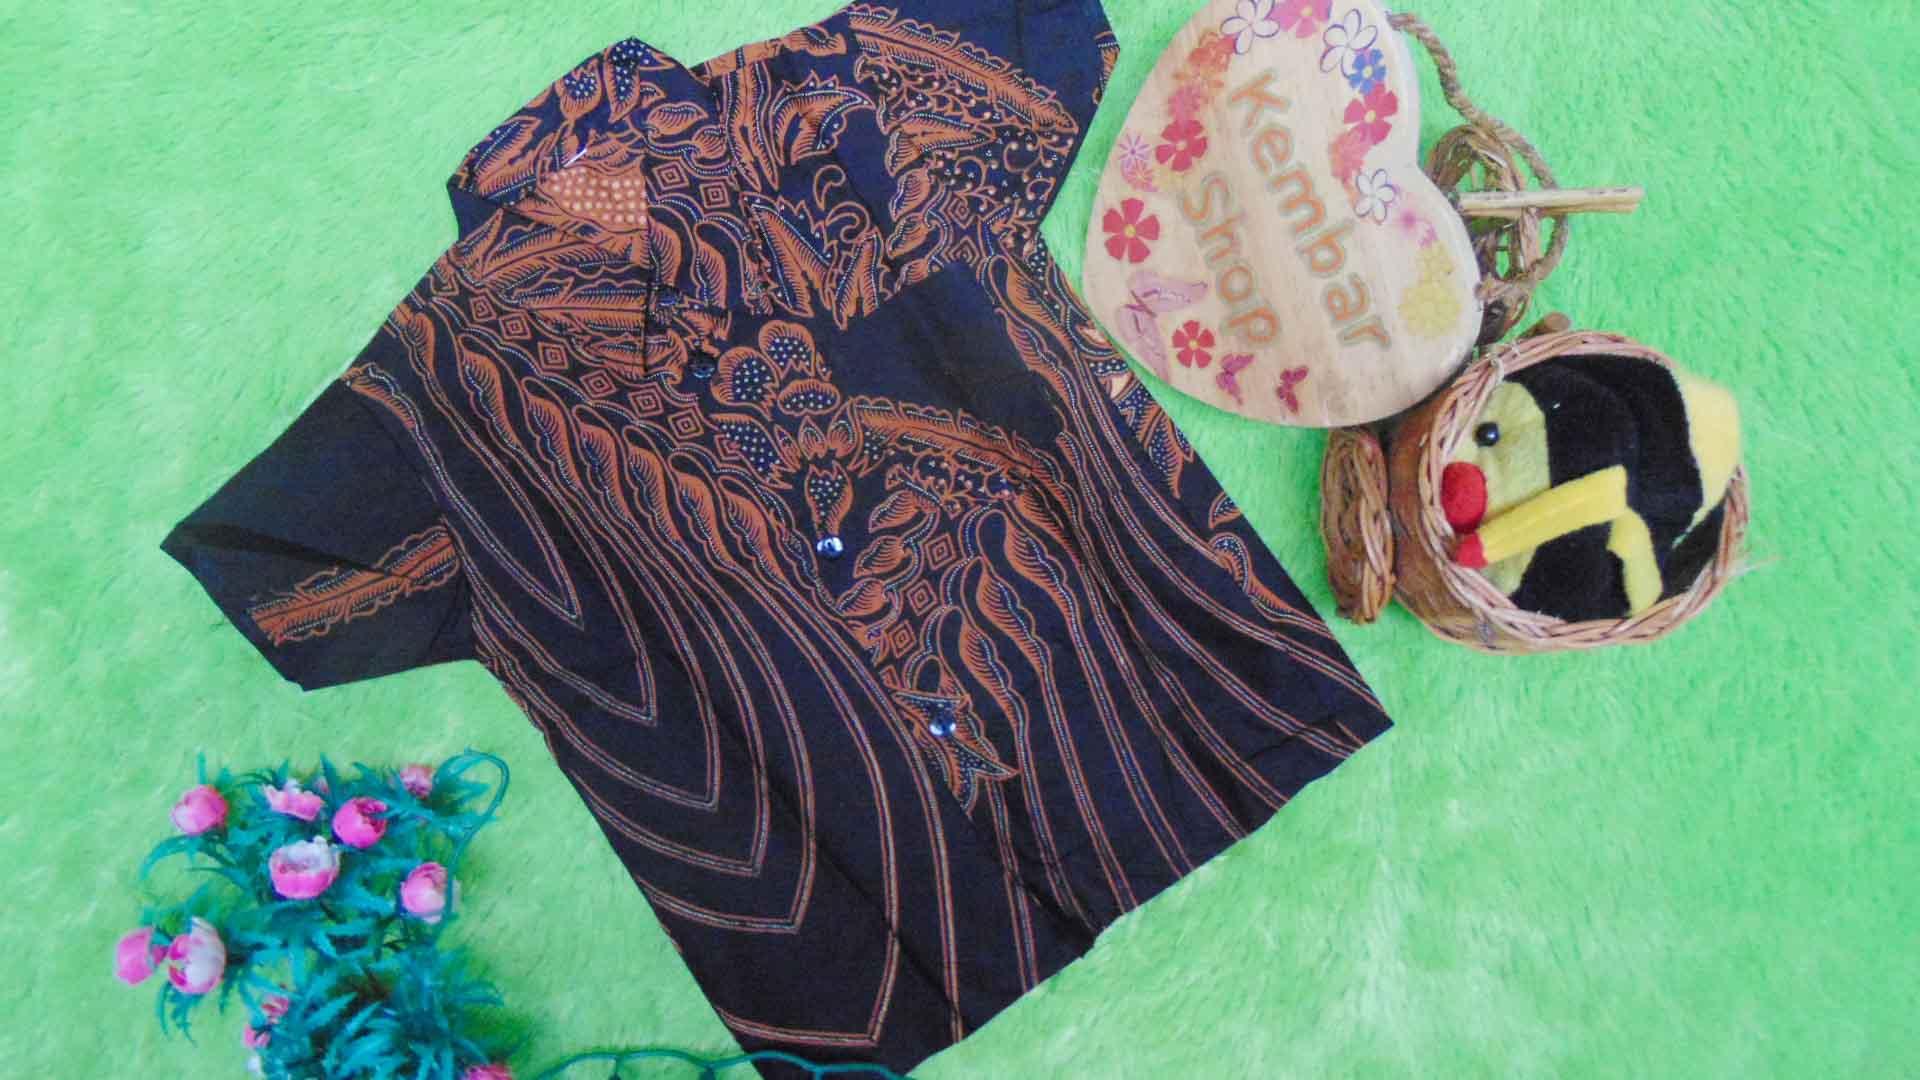 baju batik bayi anak laki-laki kemeja batik batita hem anak cowok uk 1-3th baju pesta motif temali ireng